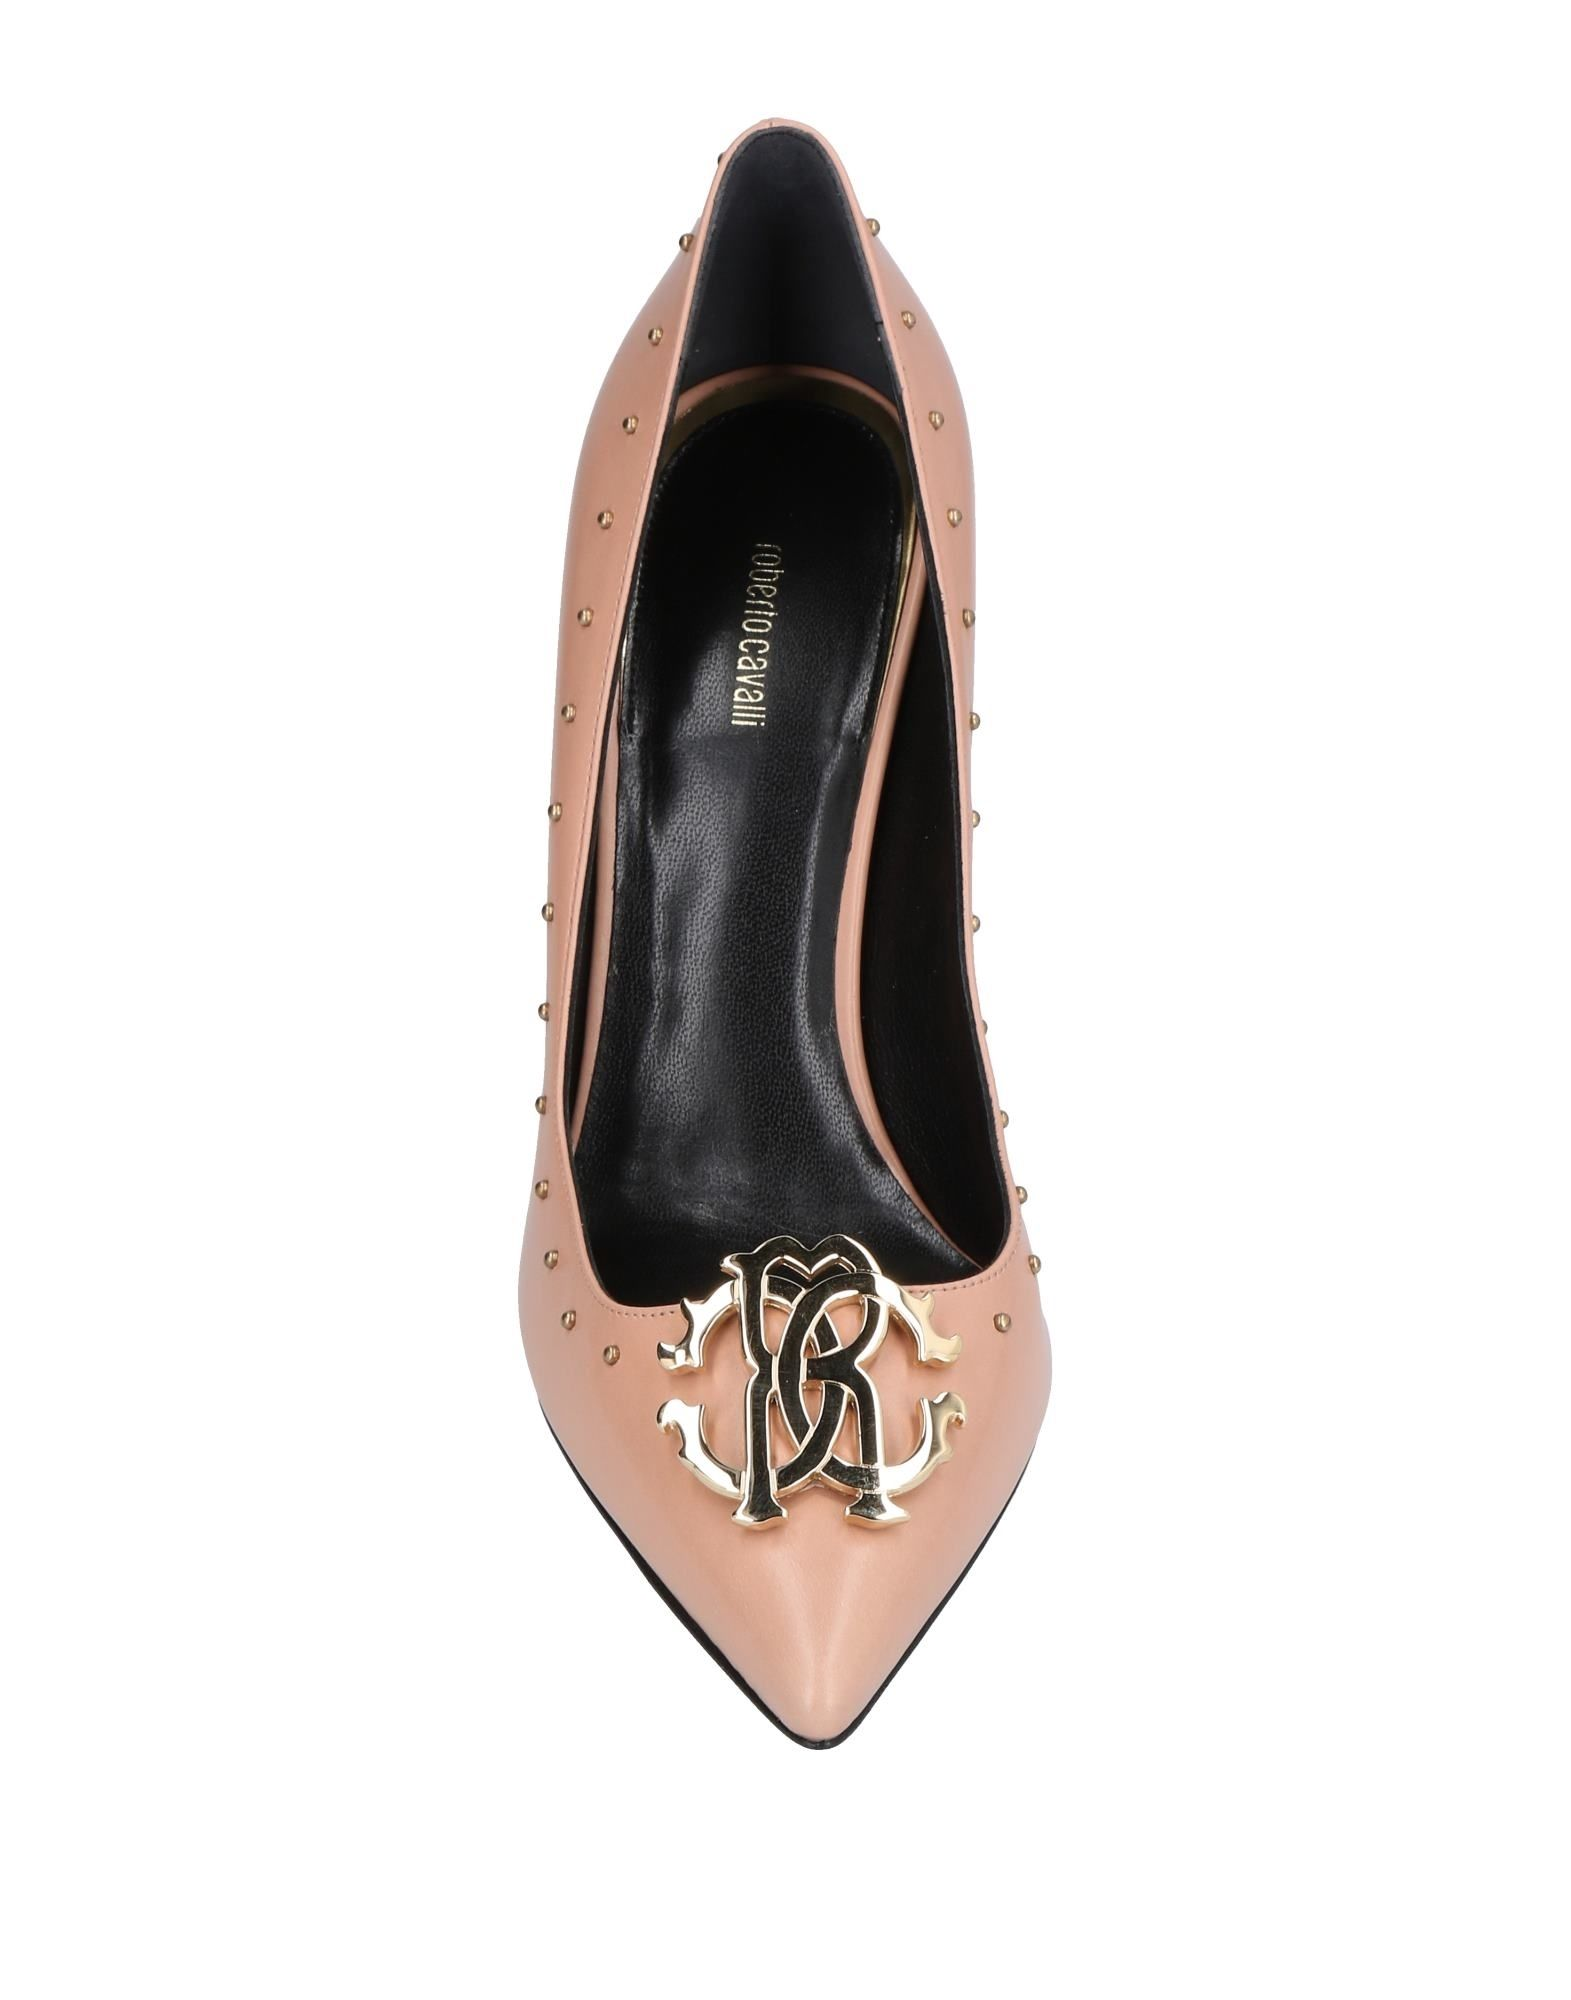 Rabatt Schuhe Roberto Damen Cavalli Pumps Damen Roberto  11458895CL 1a4c2a